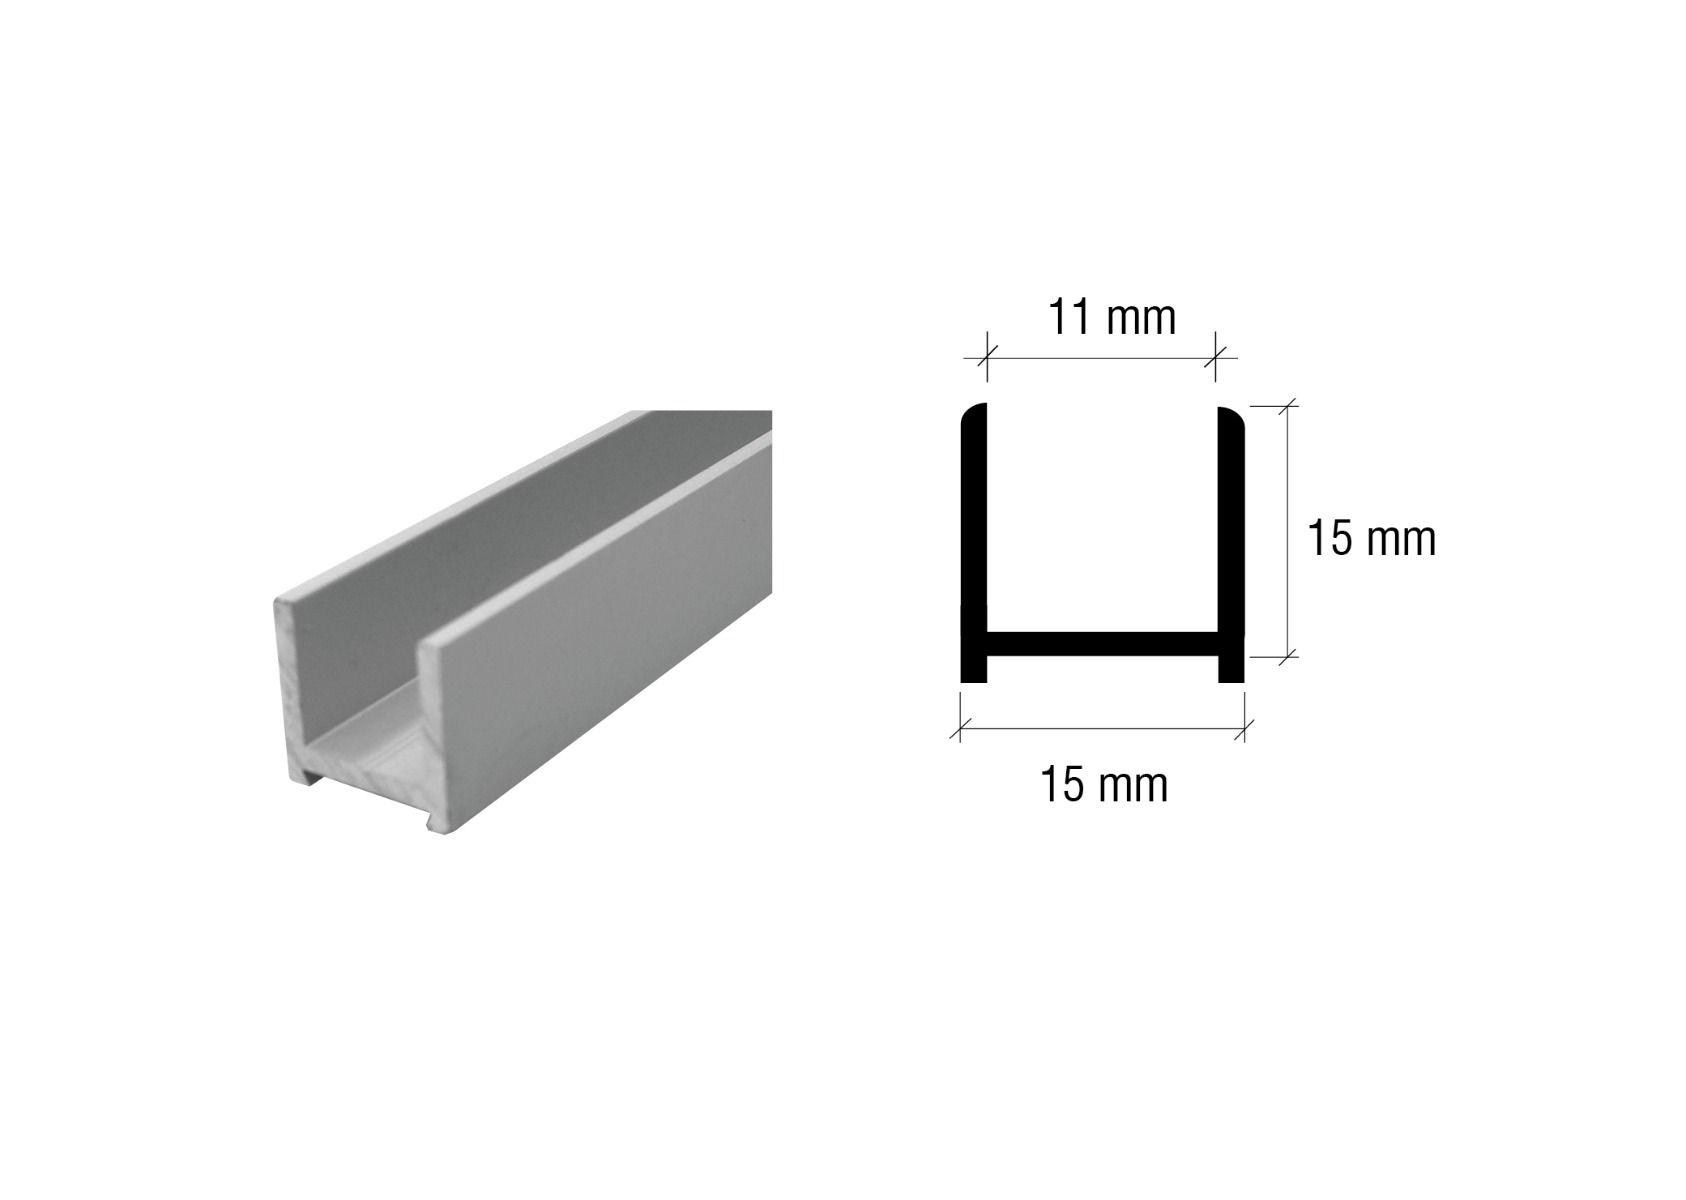 CRL Aluminium U-Profil für 8 - 10 mm und 10 - 12 mm, 2,5 m